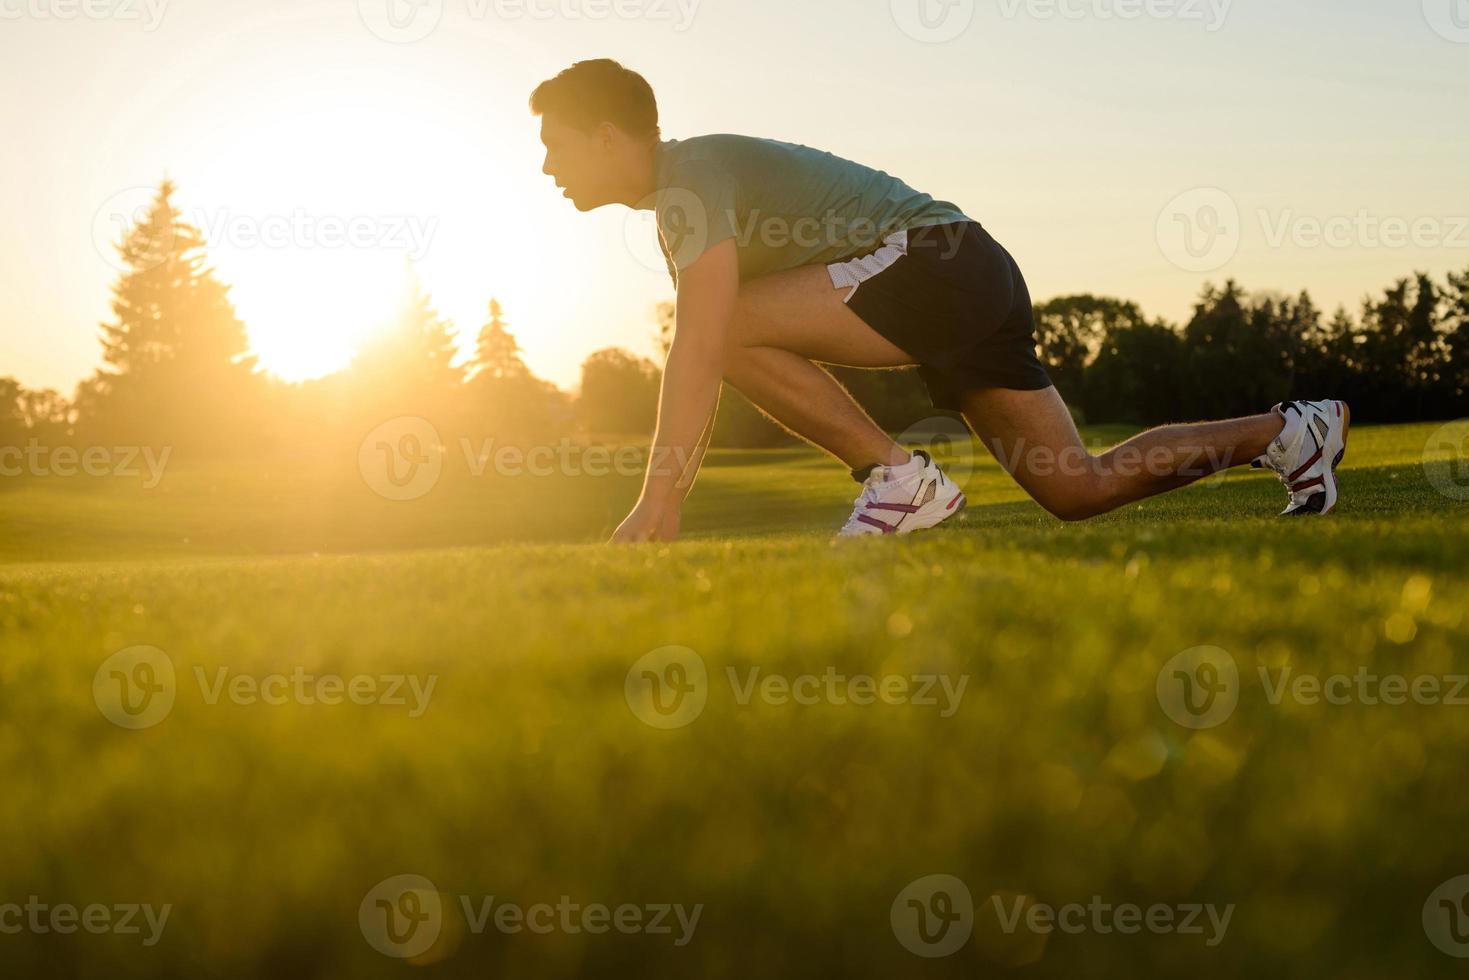 atleta se preparando para a corrida. foto